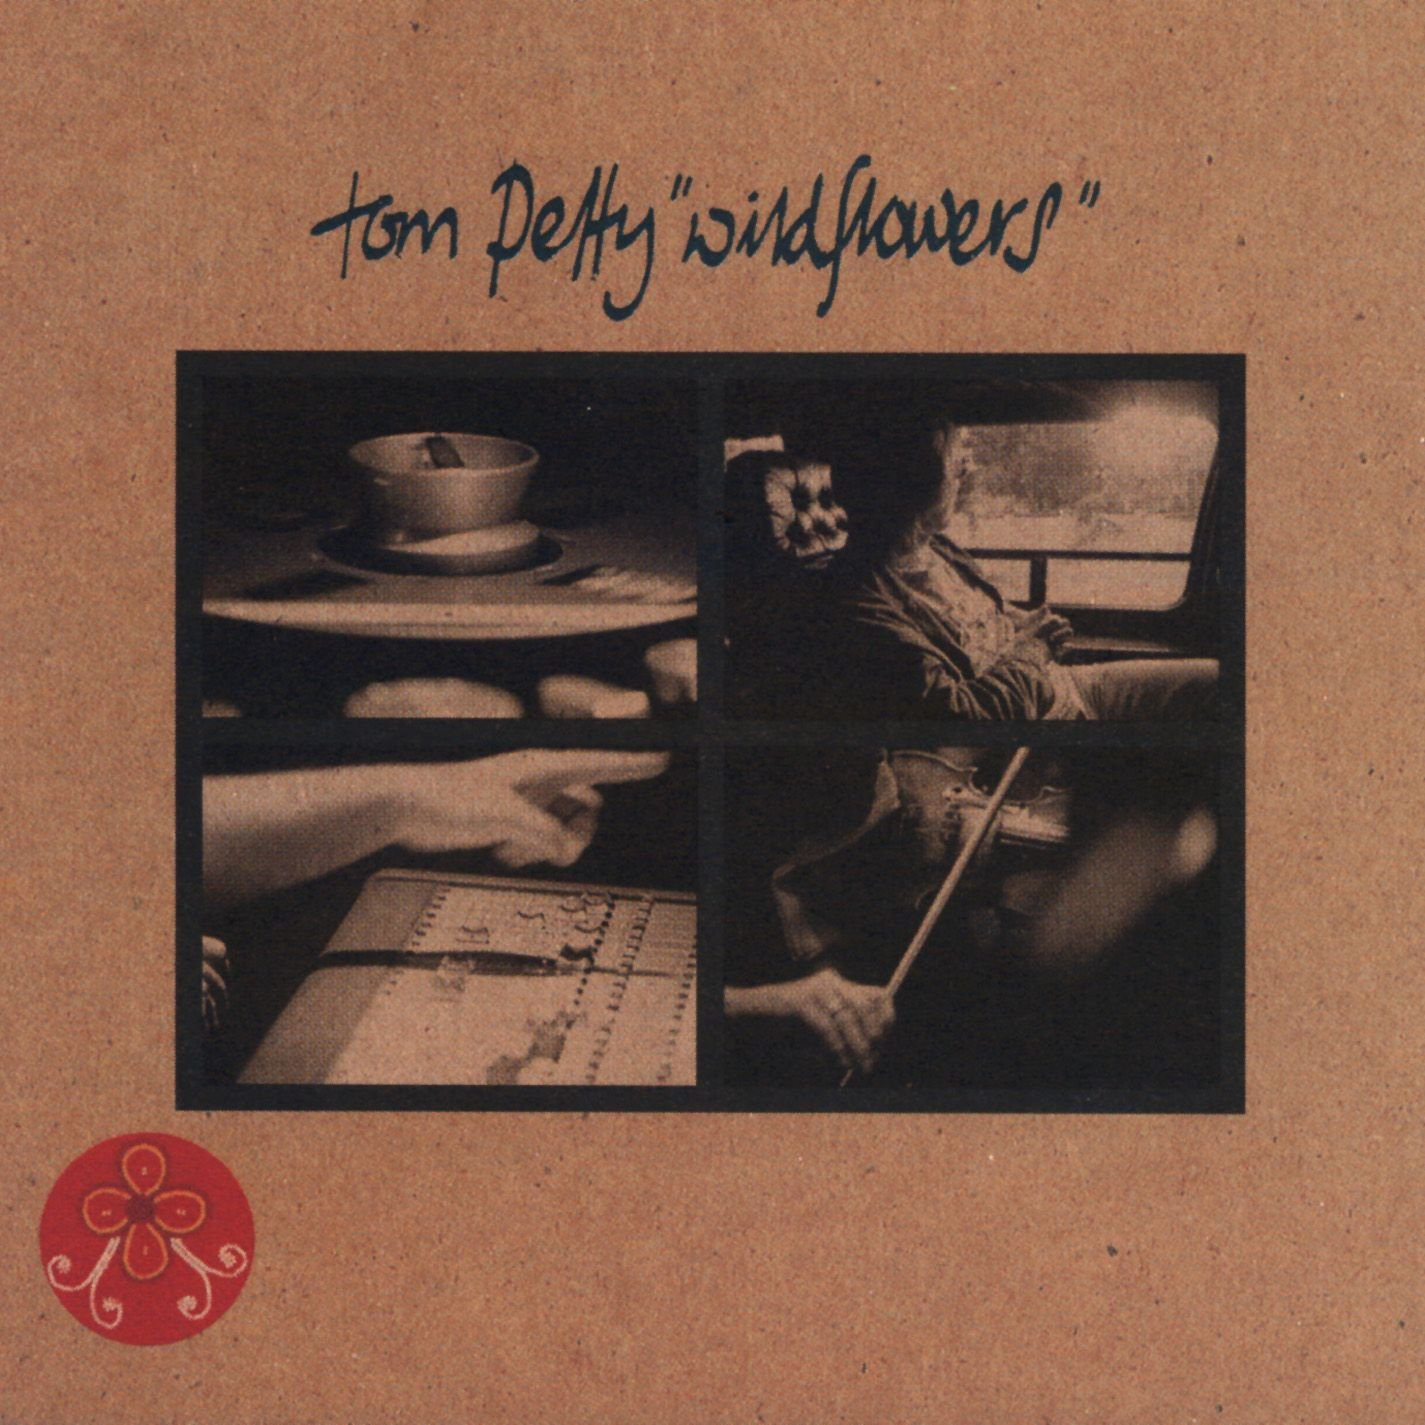 Wild Flowers: Tom Petty: Amazon.es: Música